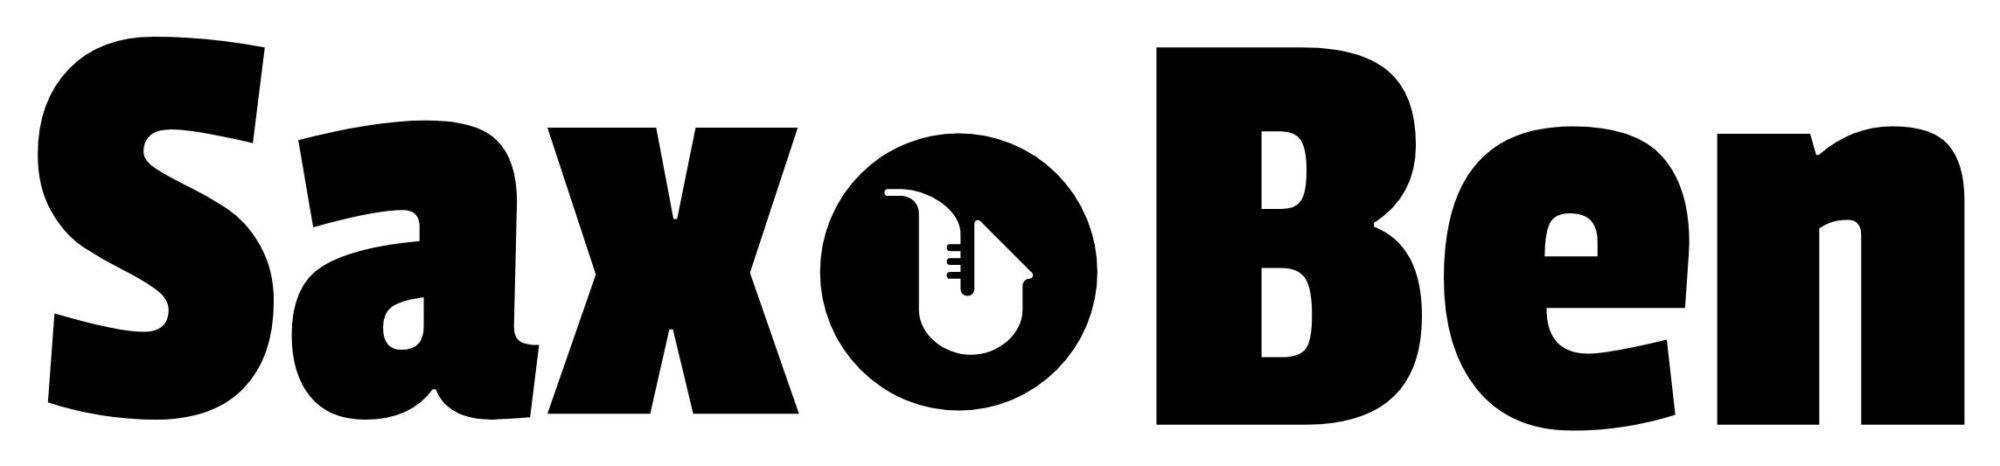 benjaminfuehrer-logo